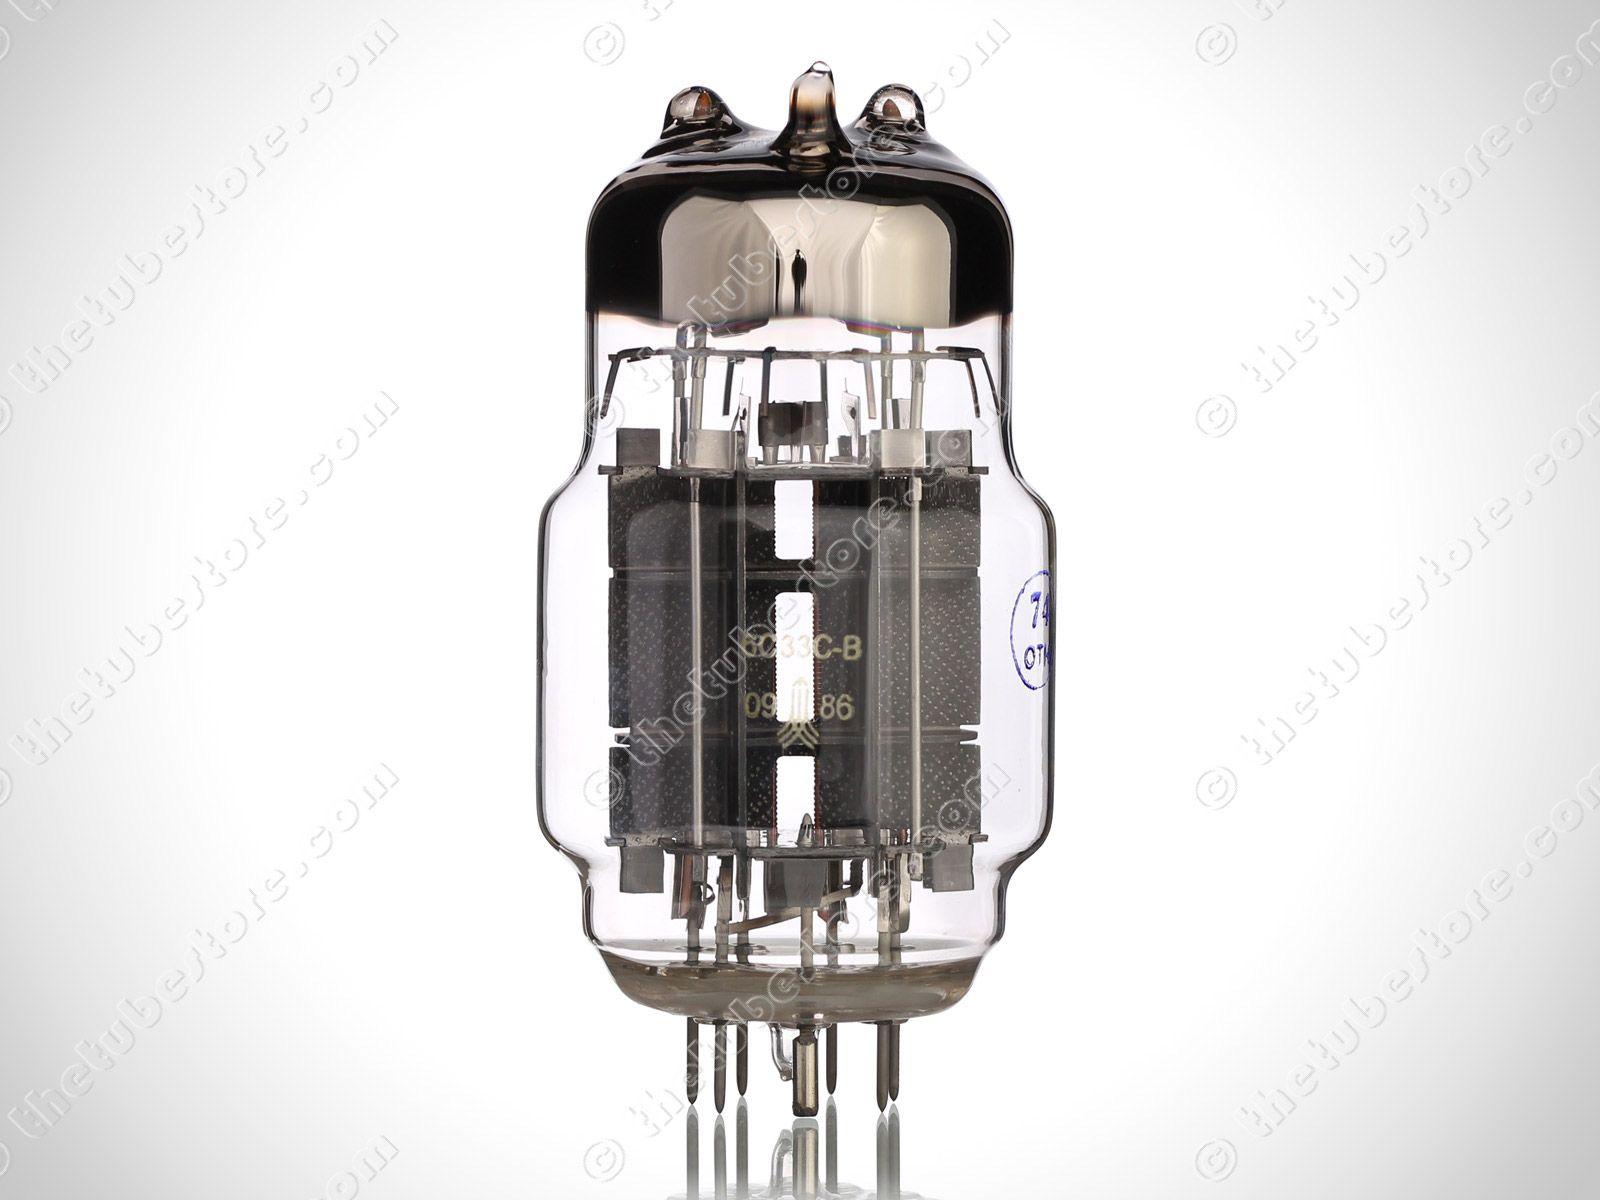 Ulyanov 6c33c B Vacuum Tube Tube Audio